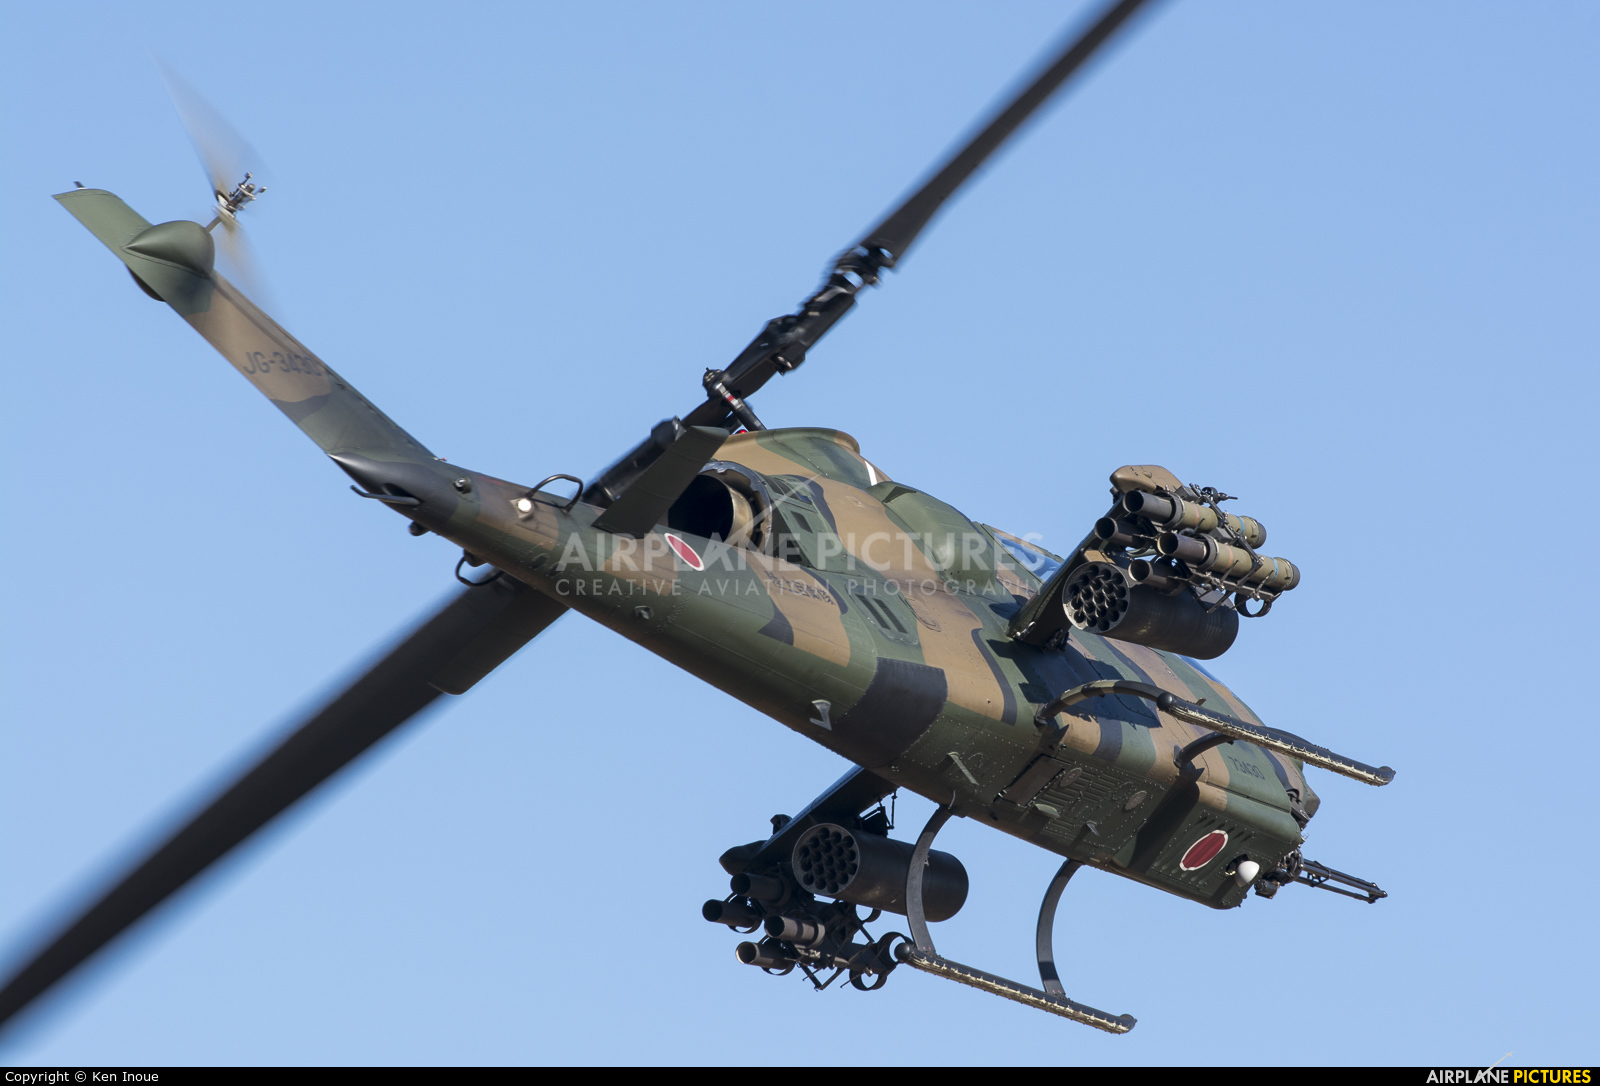 Japan - Ground Self Defense Force 73430 aircraft at Off Airport - Japan